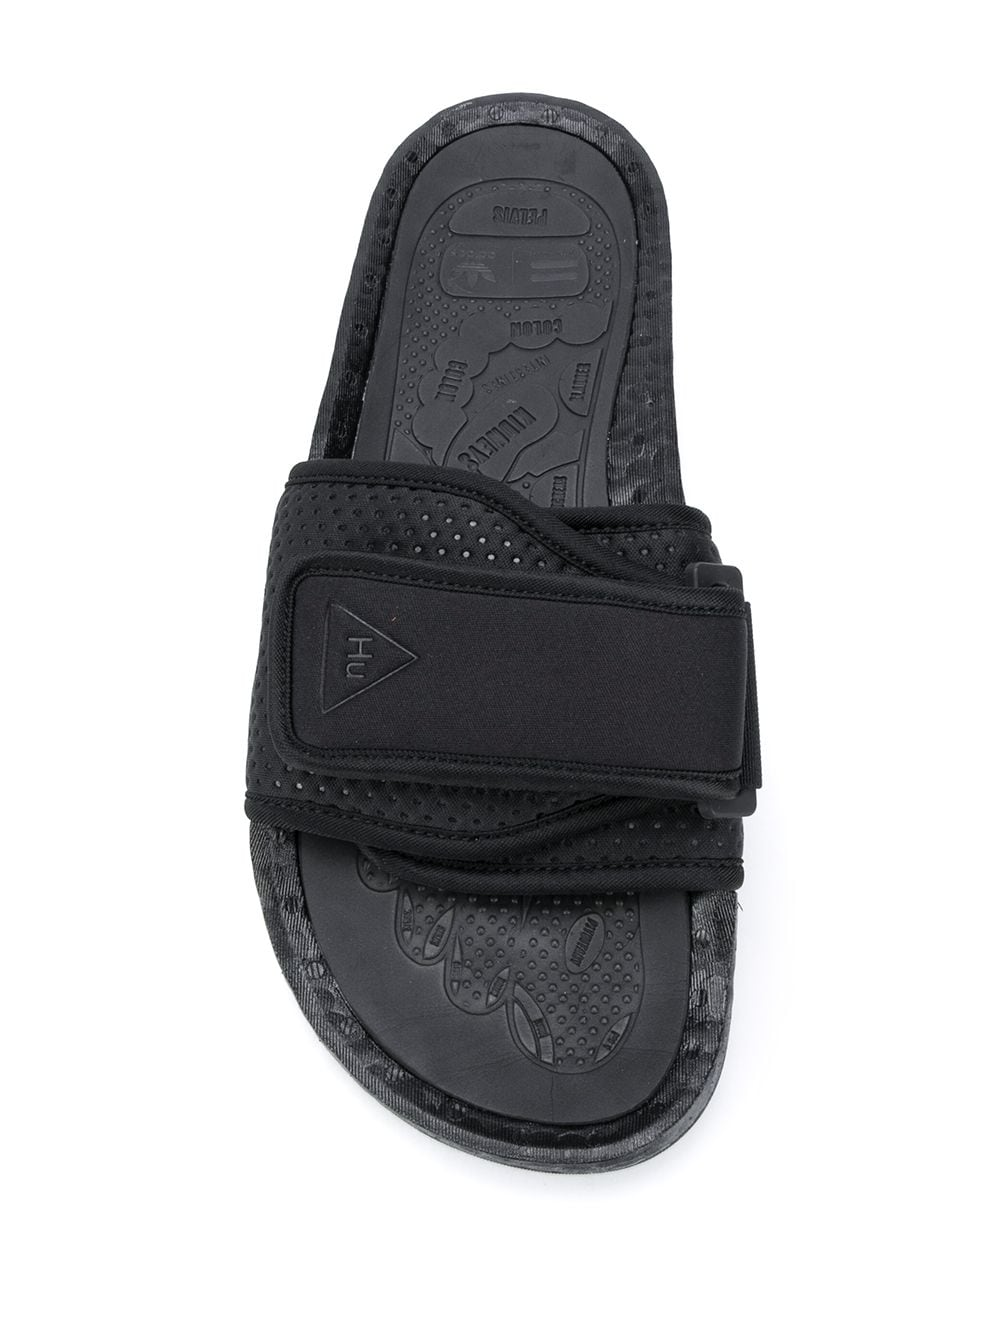 adidas by Pharrell Williams Boost sole pool slides - Black